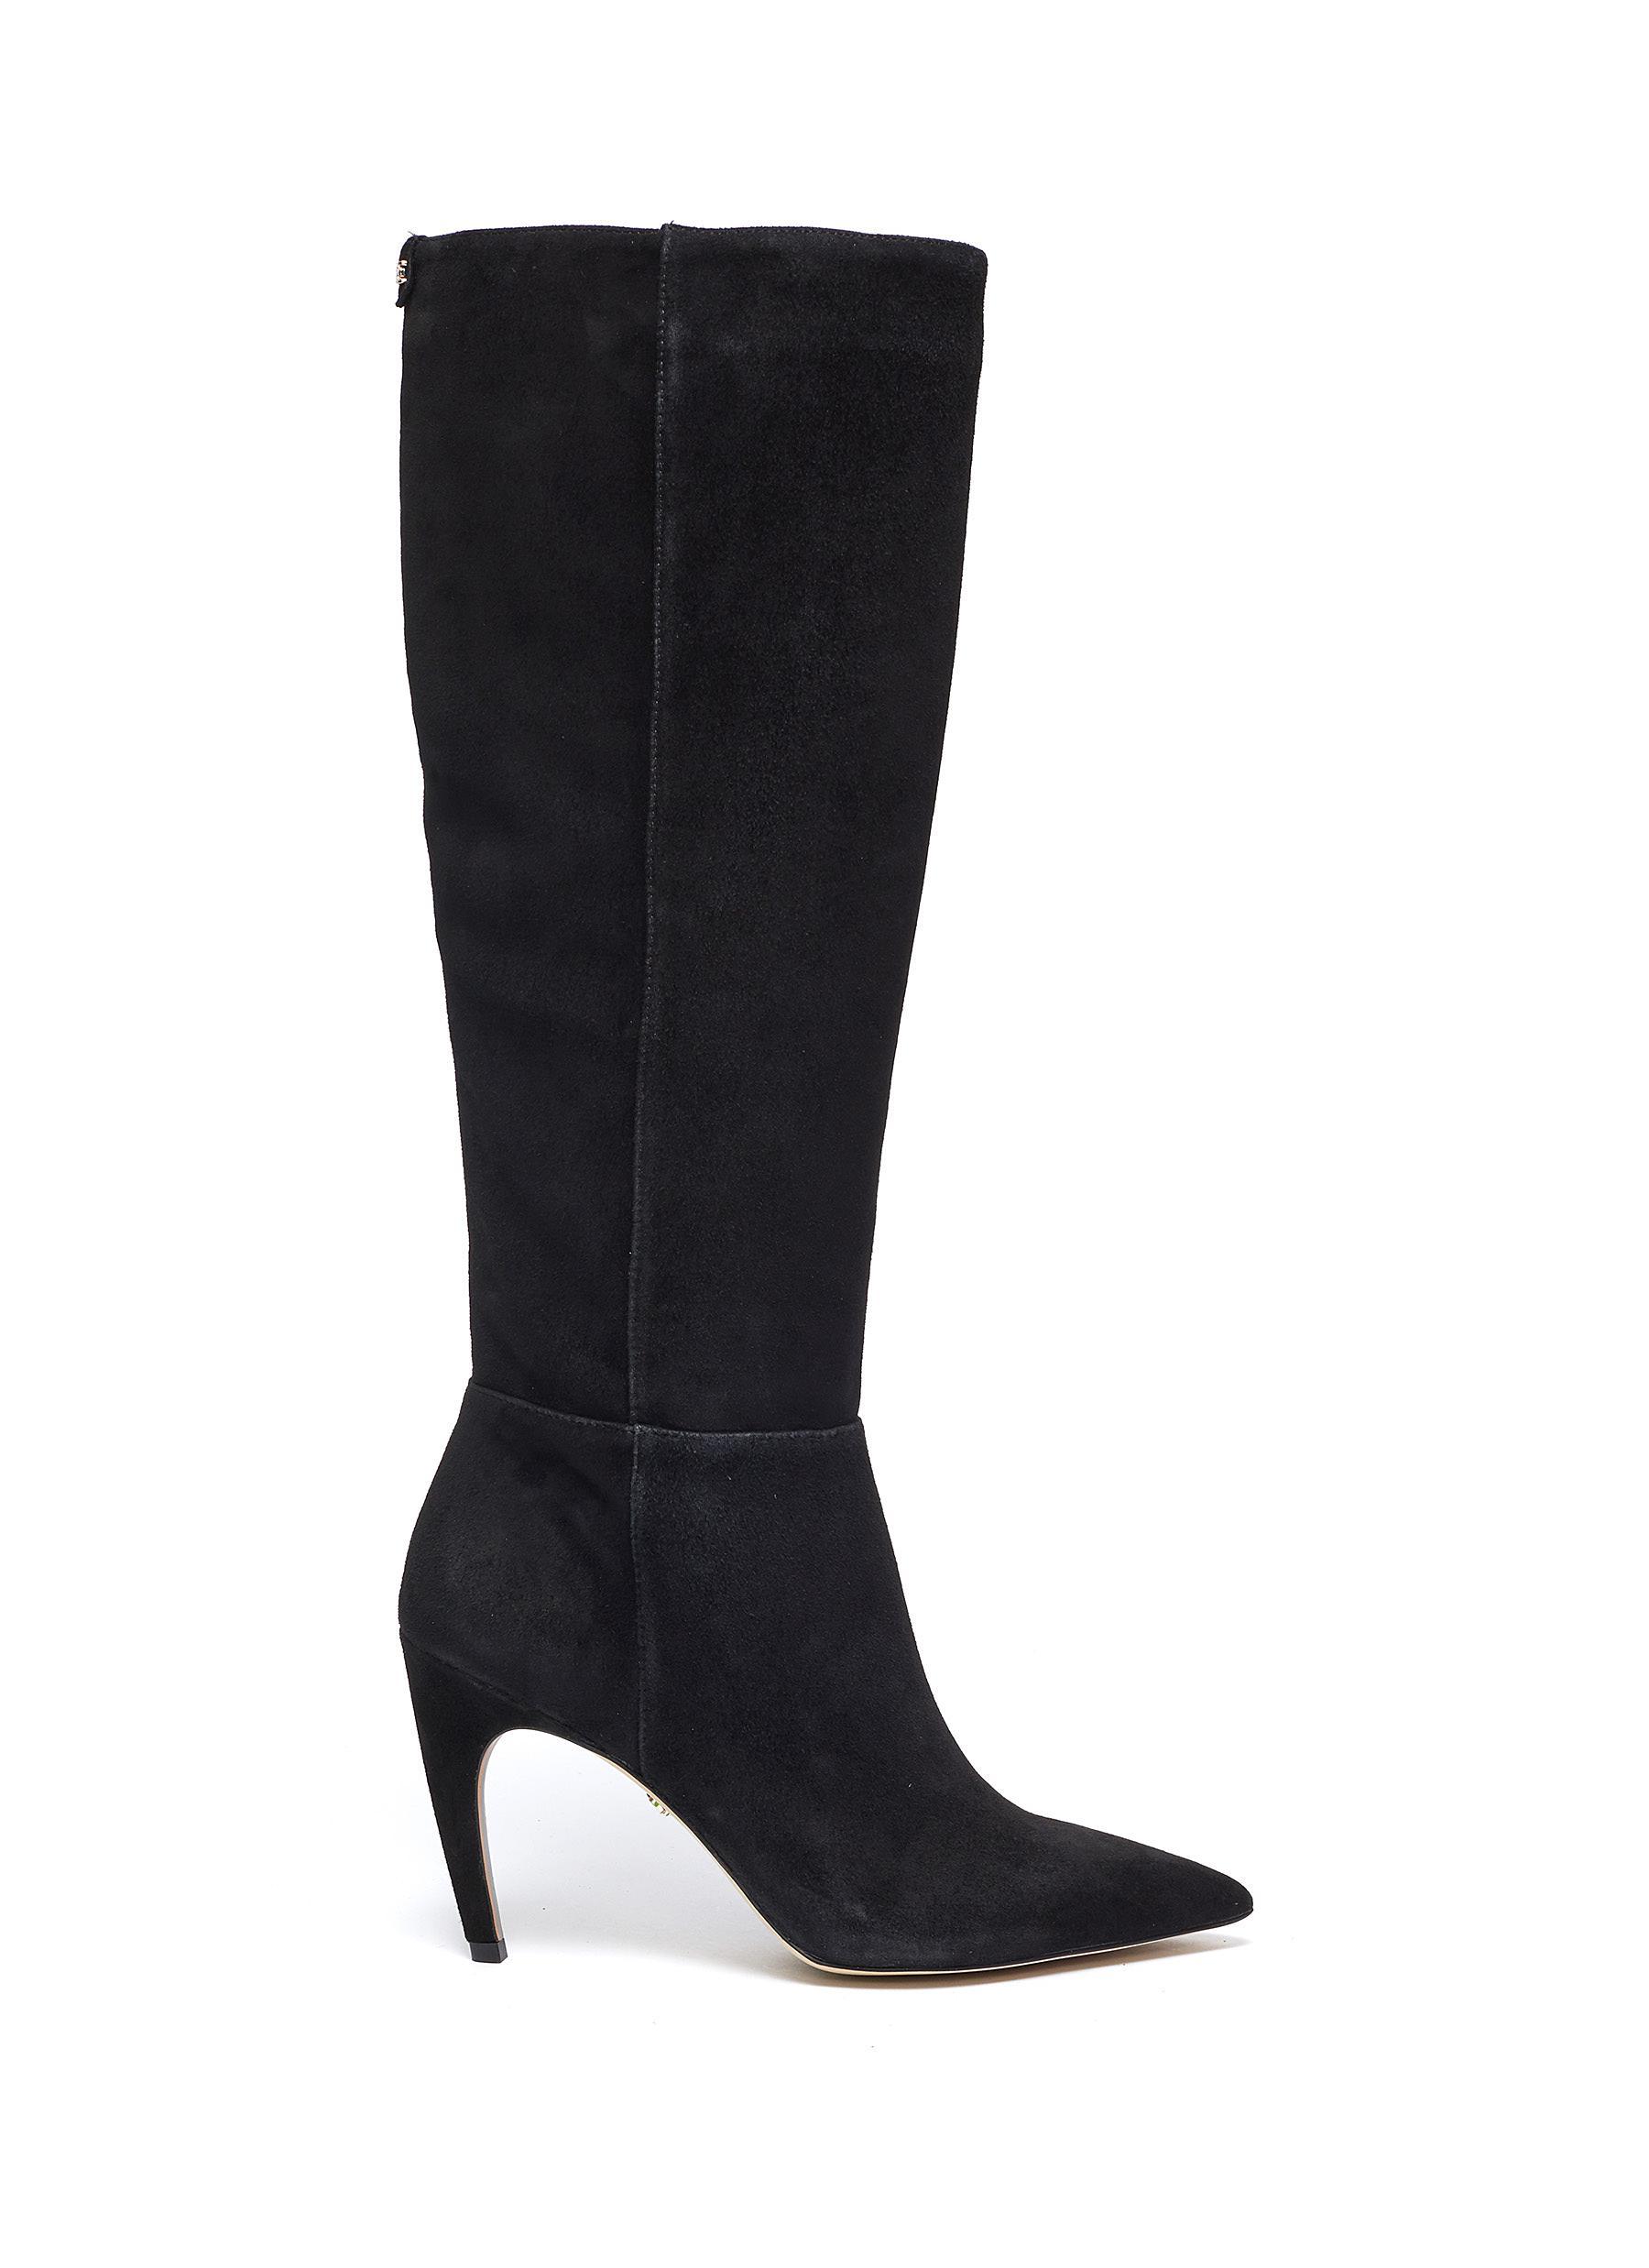 Fraya suede knee high boots by Sam Edelman